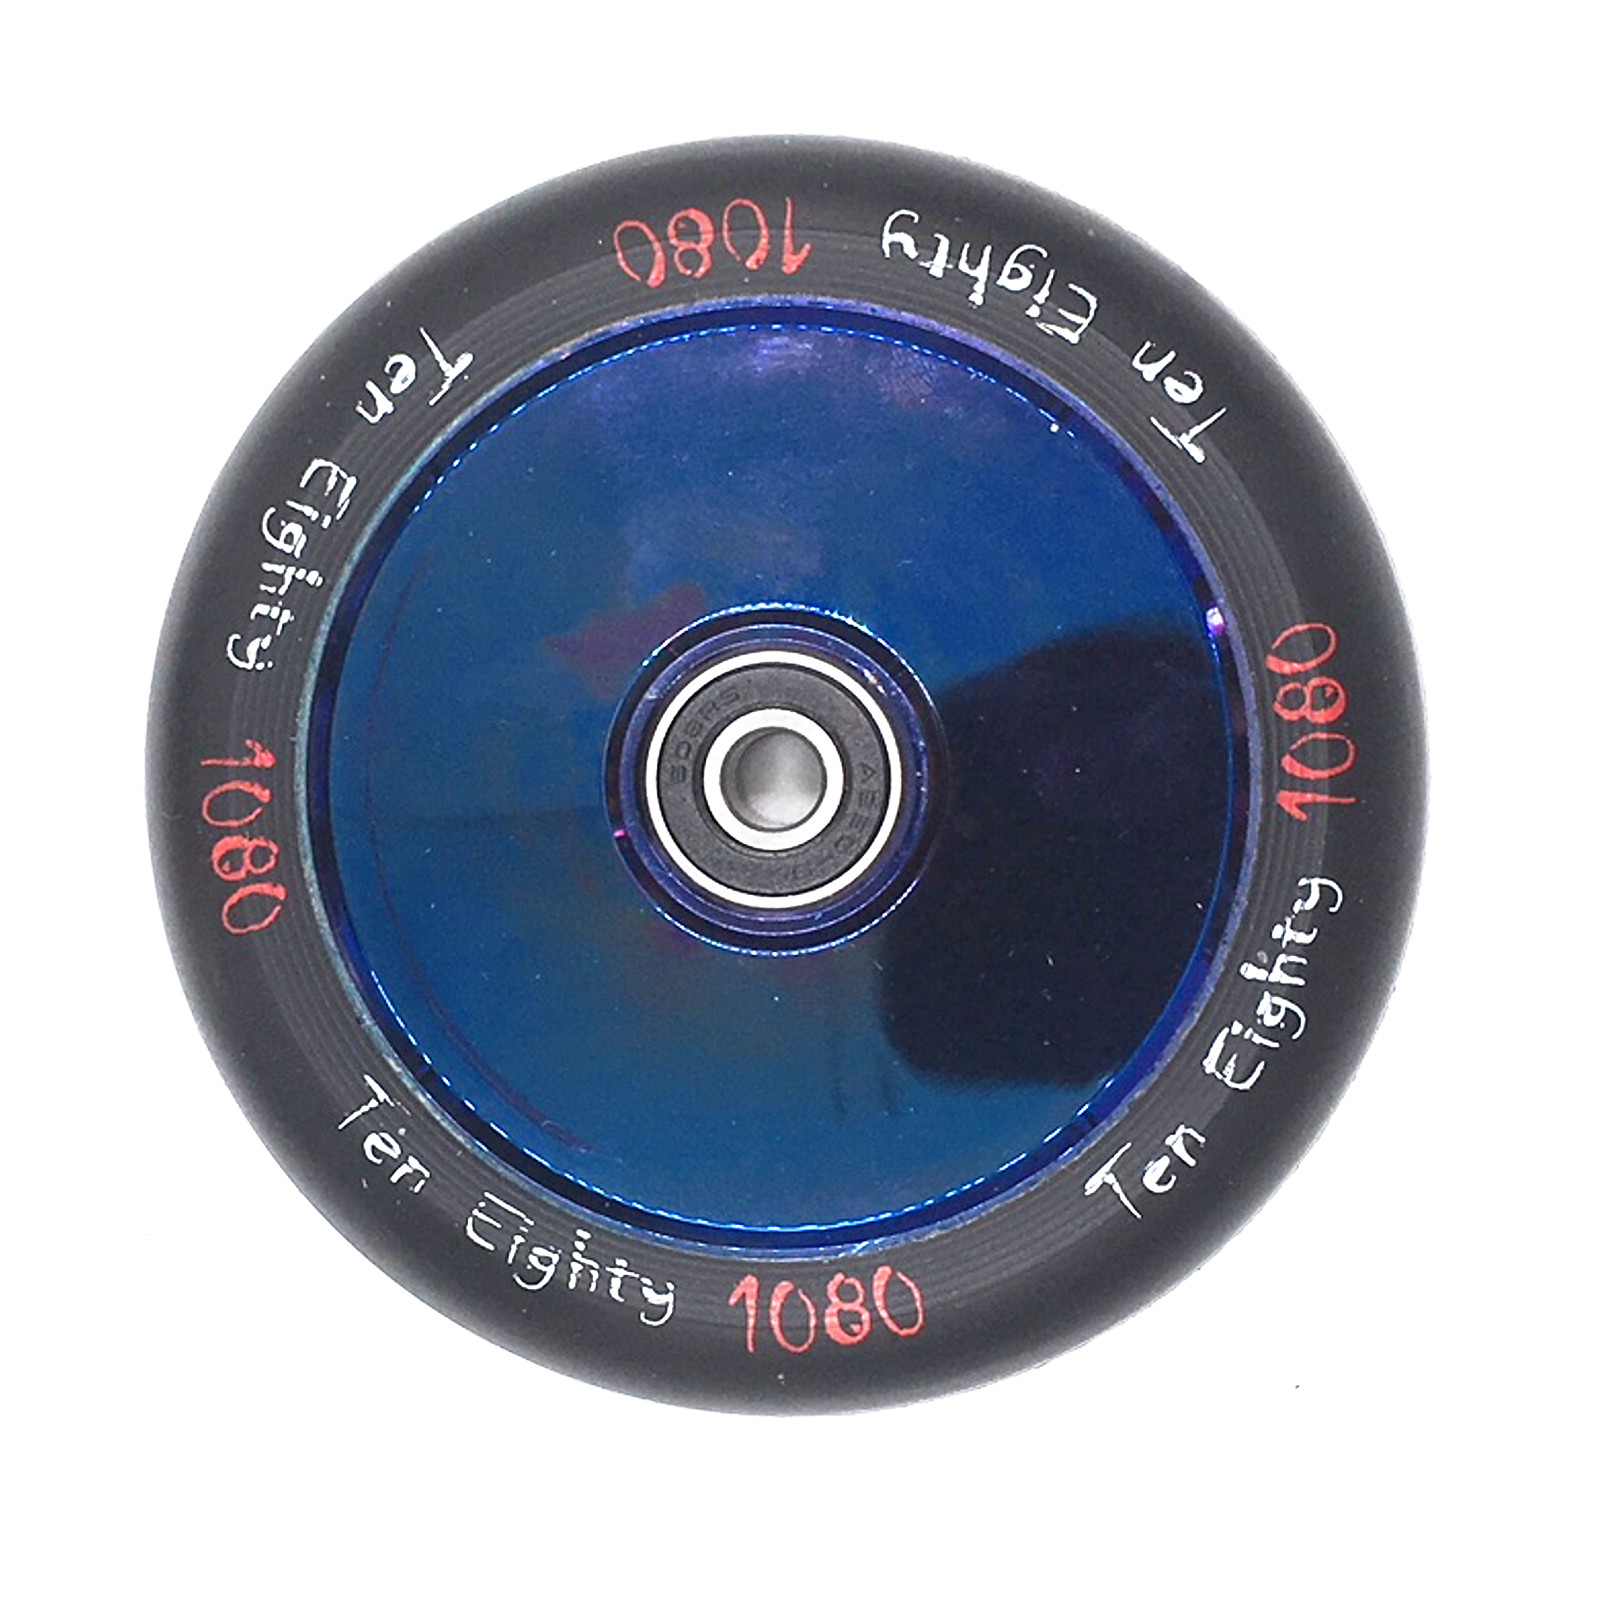 1080 creux ultra solides creux 1080 Léger Remplacement 110 mm Stunt Scooter Roues 695c12